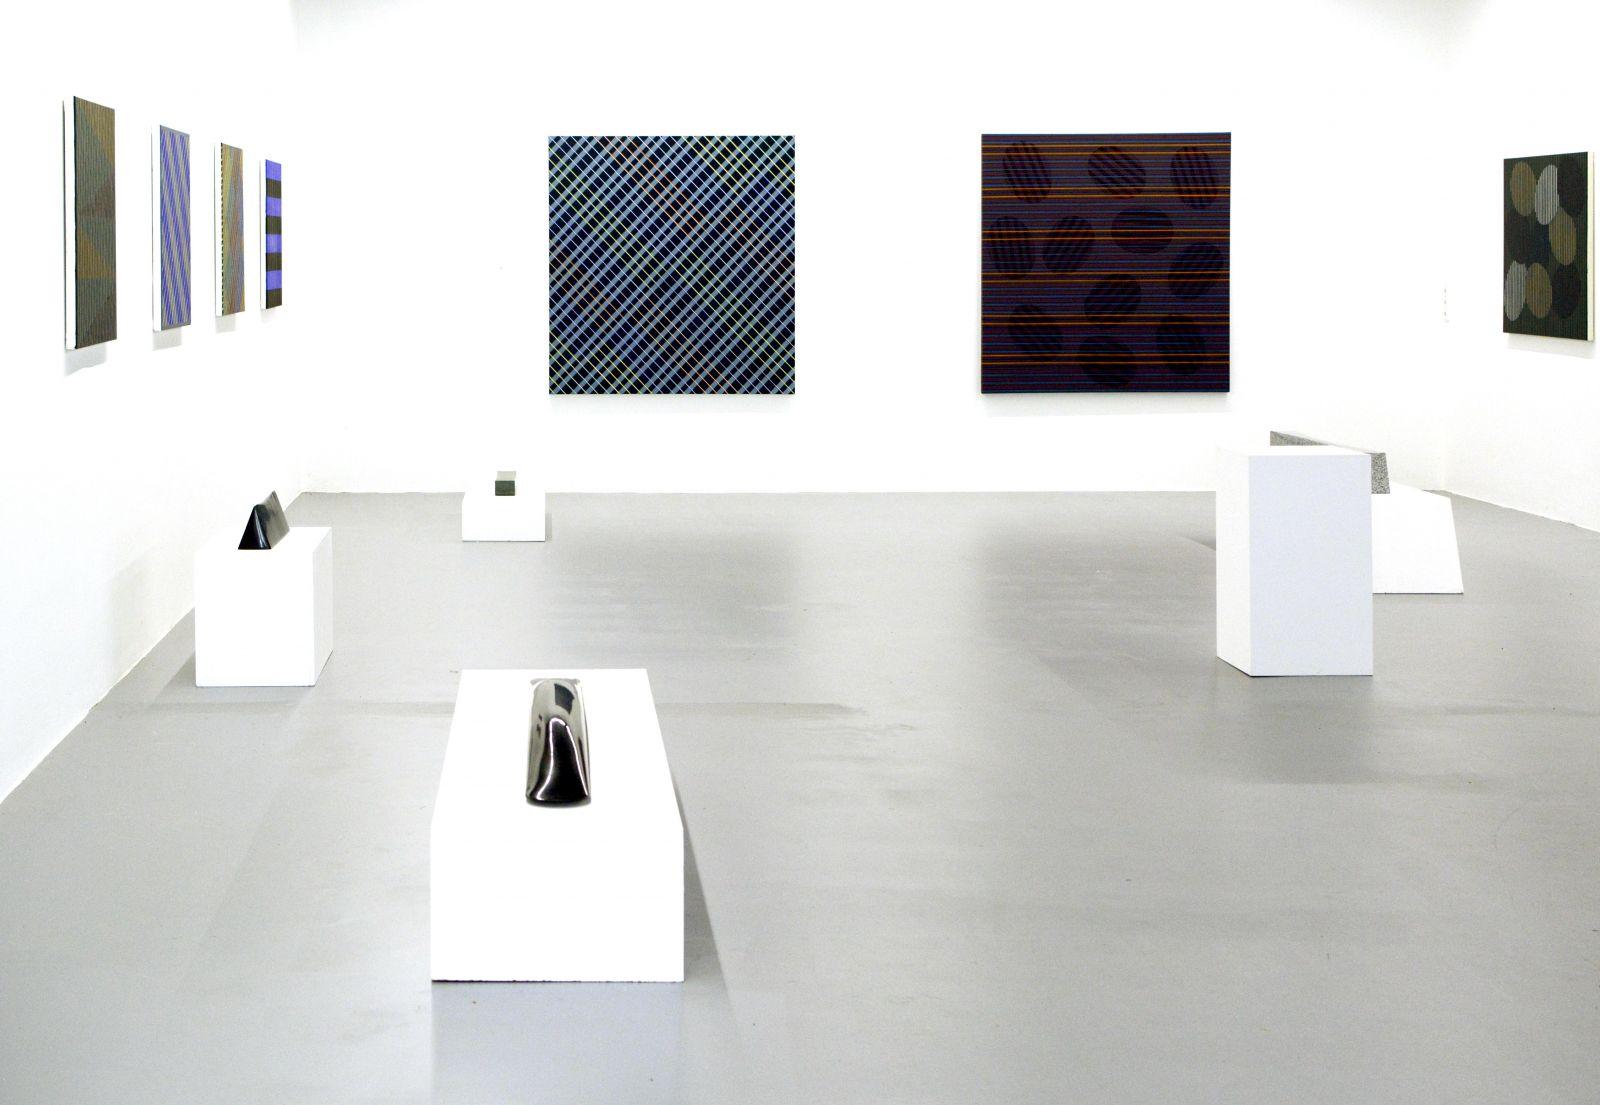 Ausstellungsansicht-Christian Eder-Linz-Galerie Brunnhofer